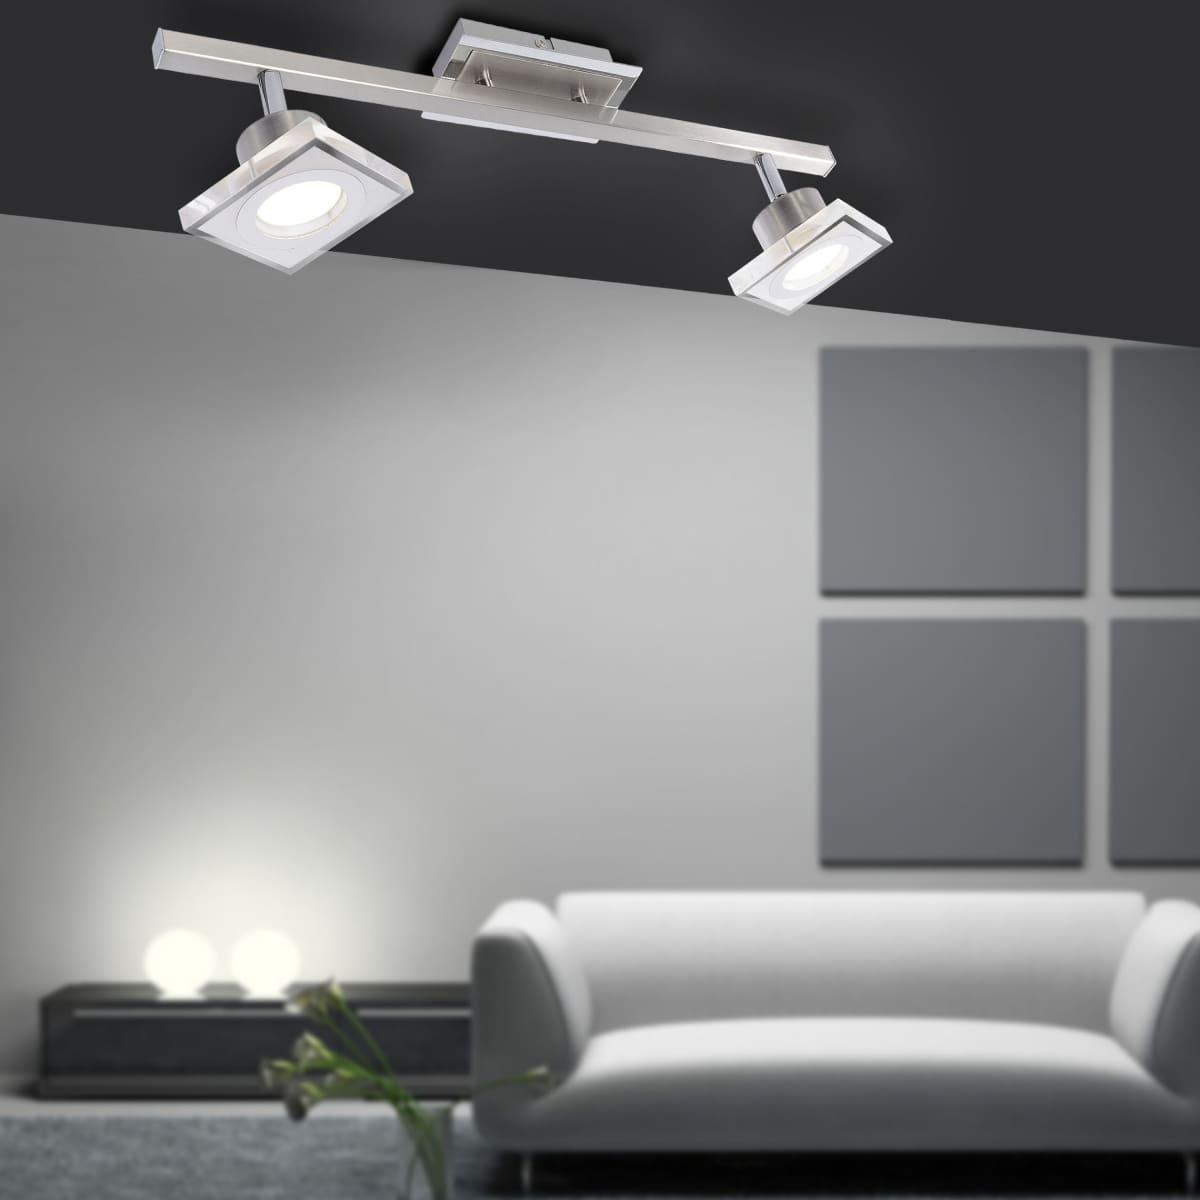 LED-Deckenleuchte, Stahl, 2 Spots, warmweiß, inkl. Switchmo Dimmfunktion